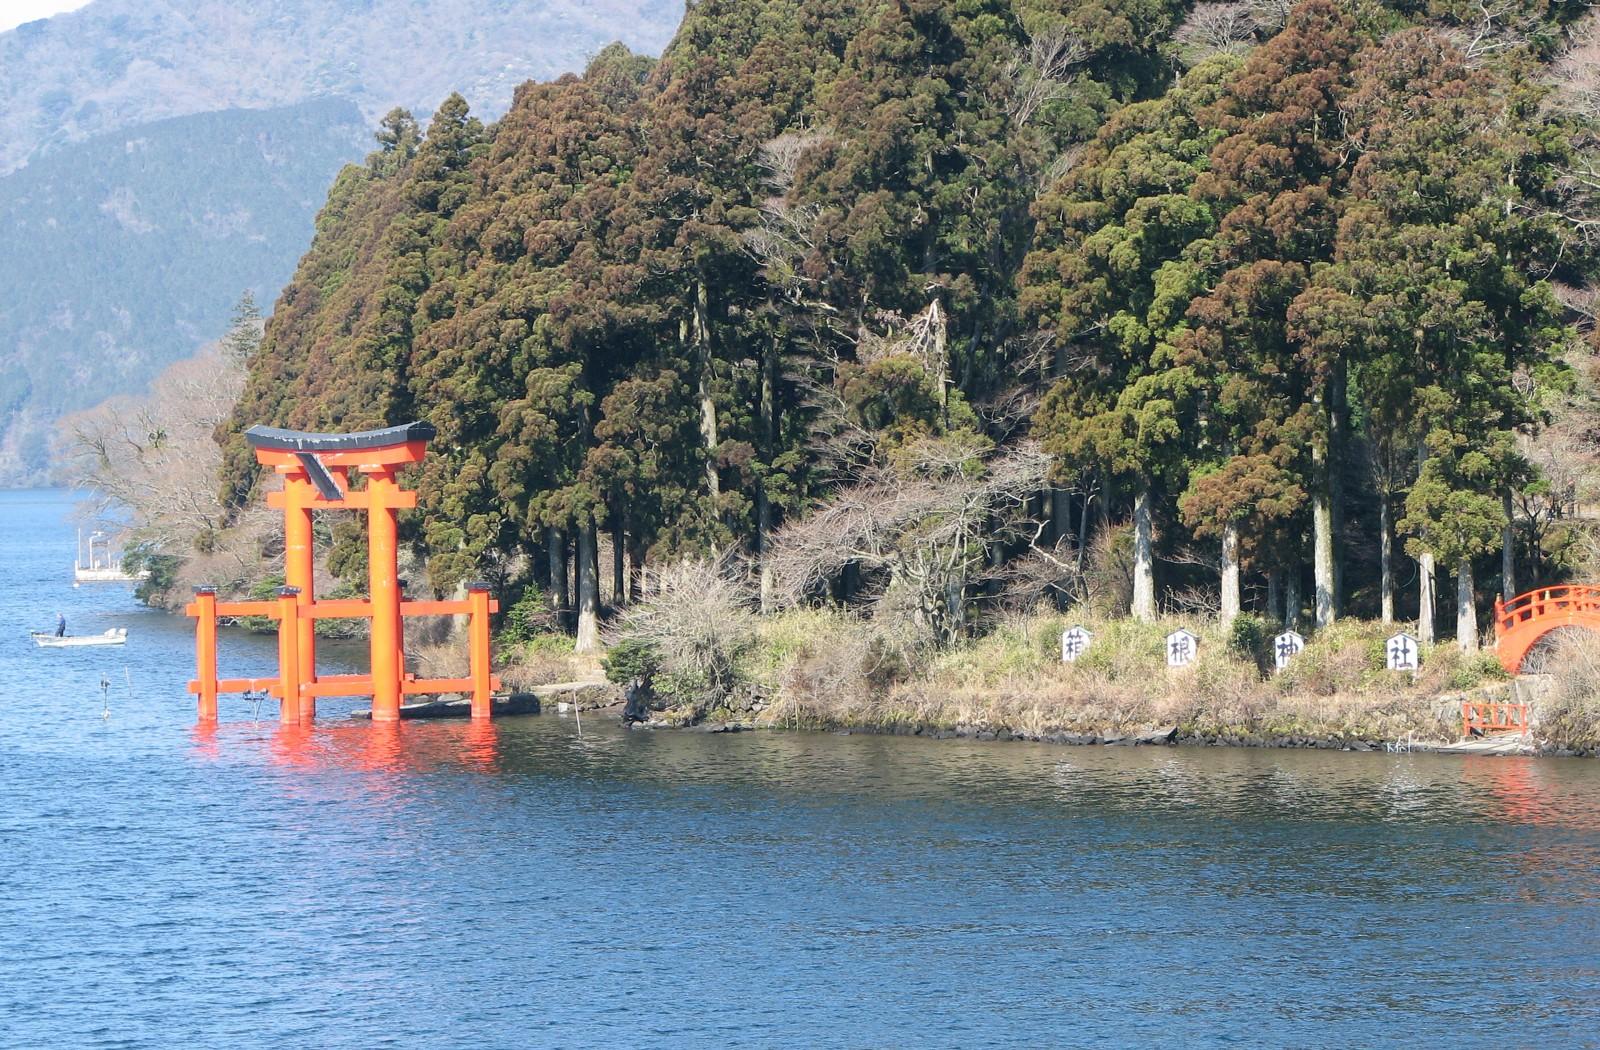 hakone jinja 箱根神社